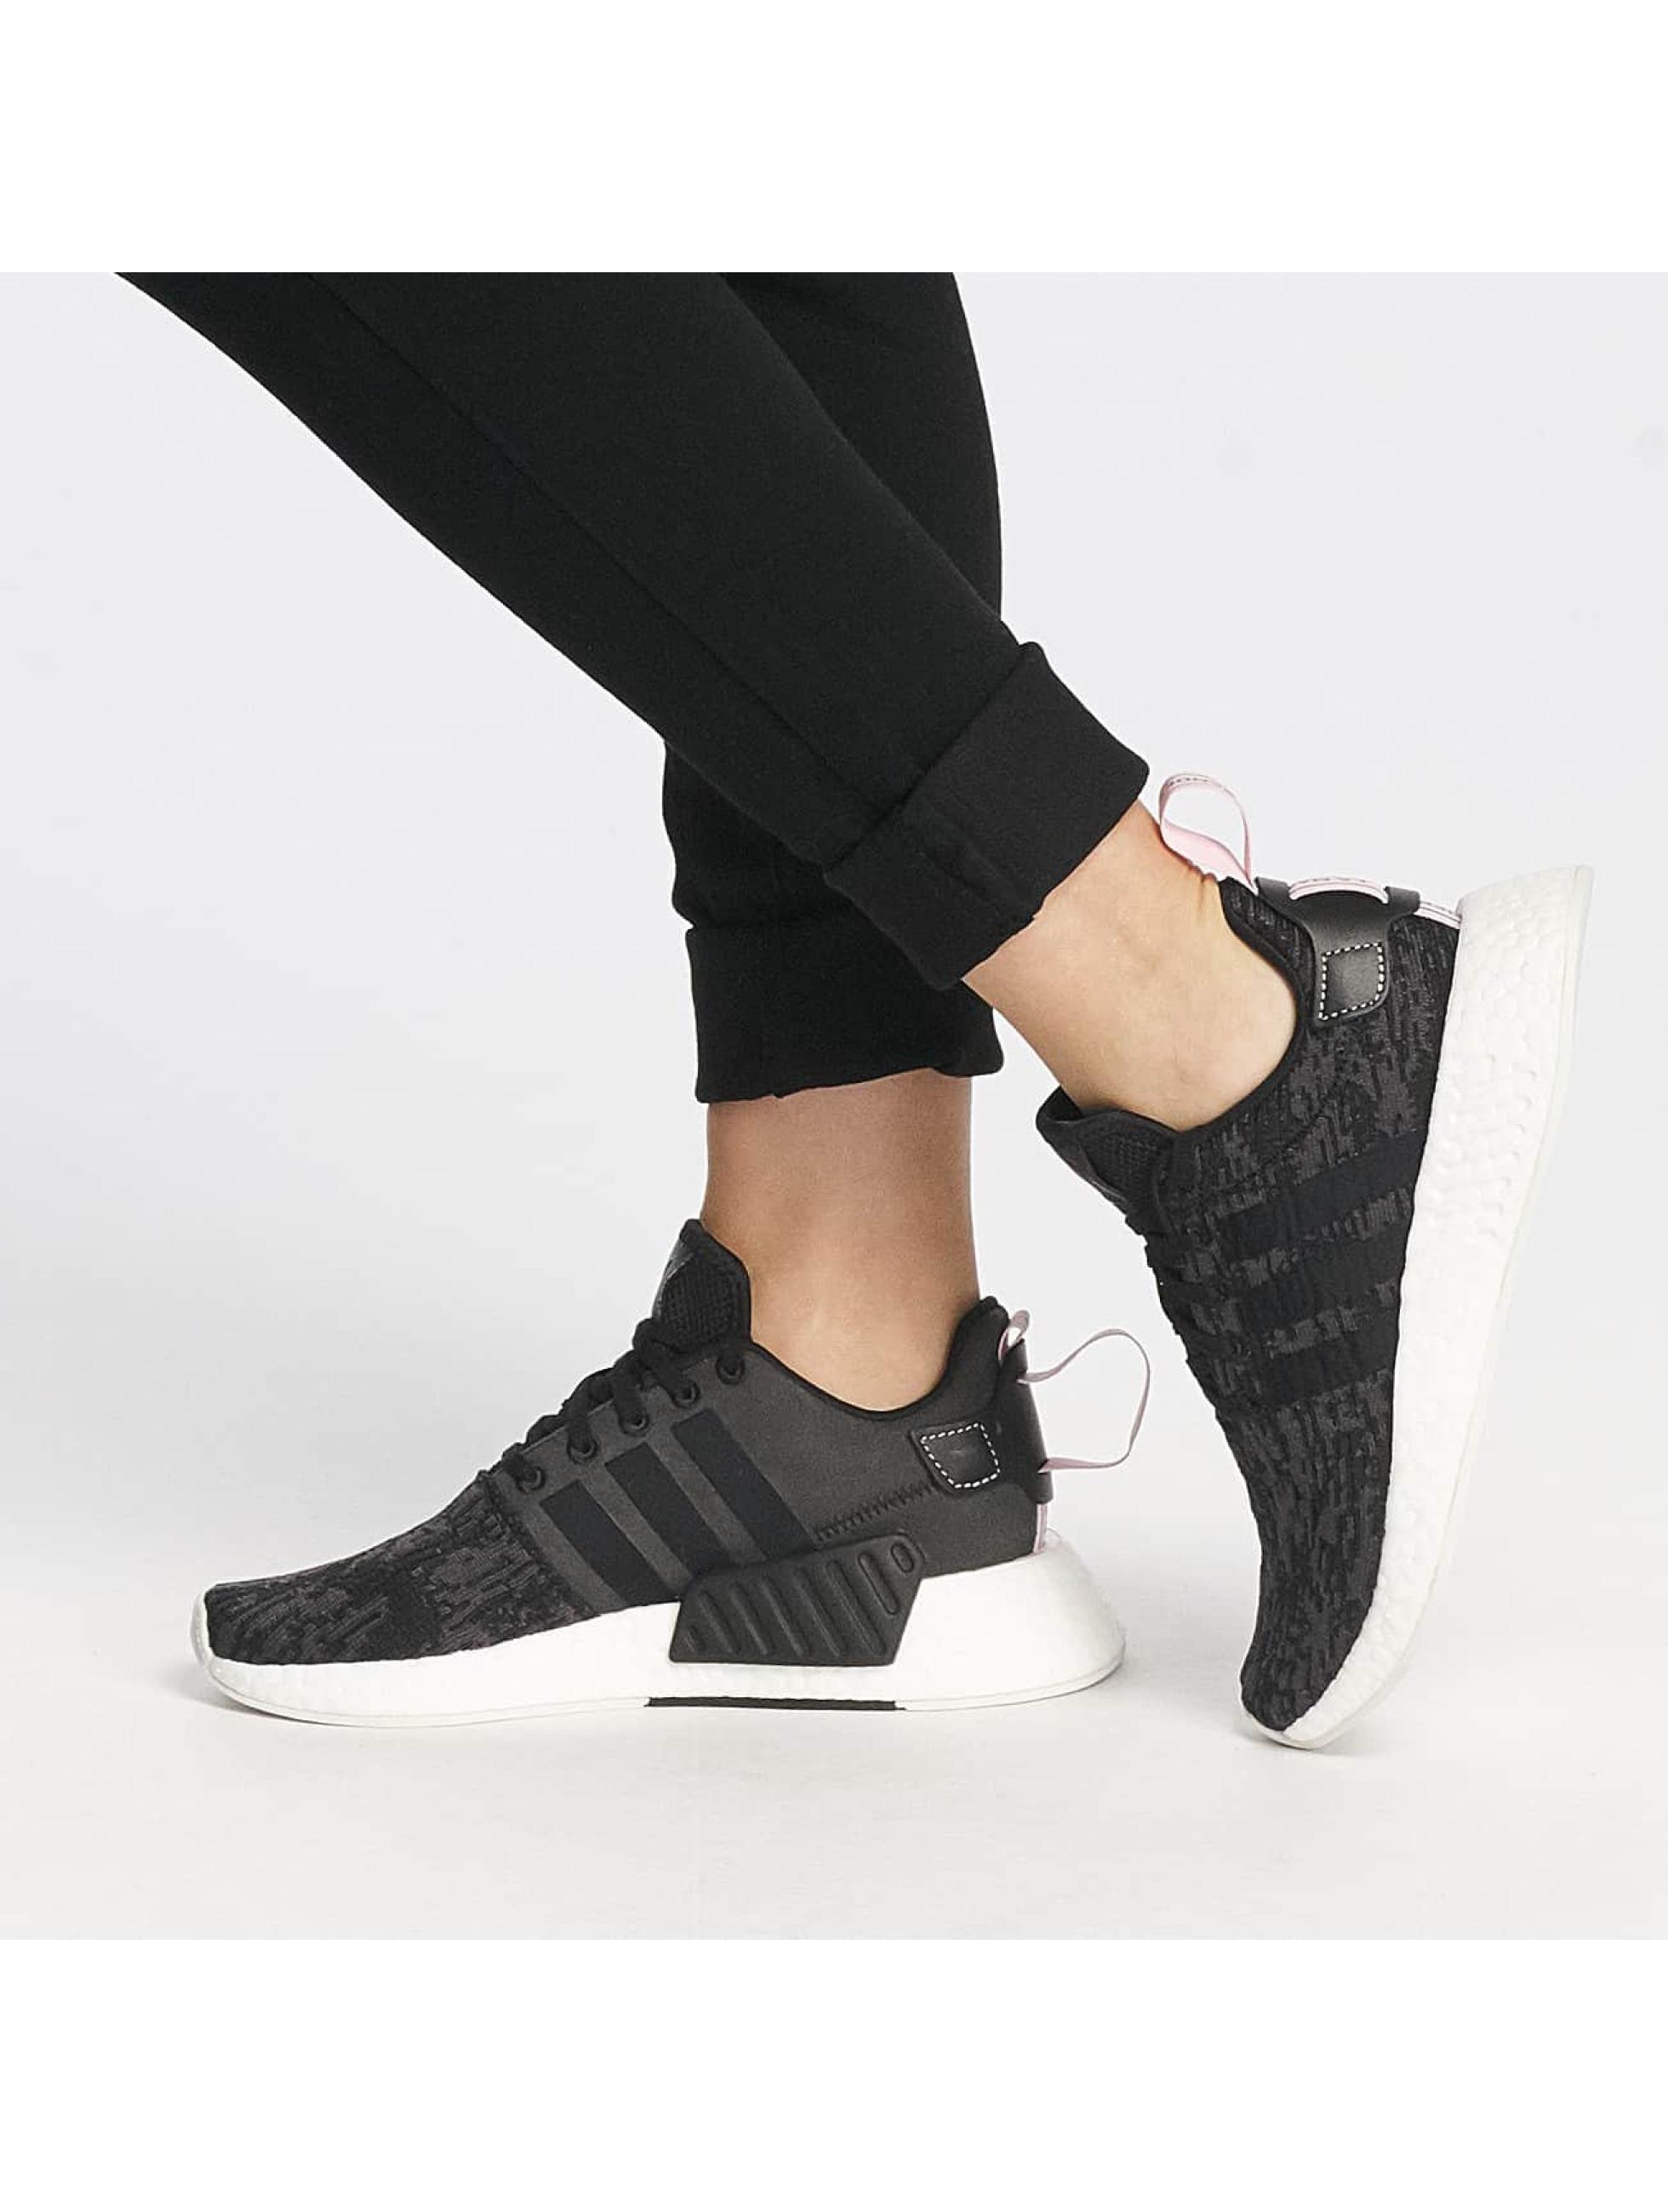 adidas originals Sneakers NMD_R2 W black